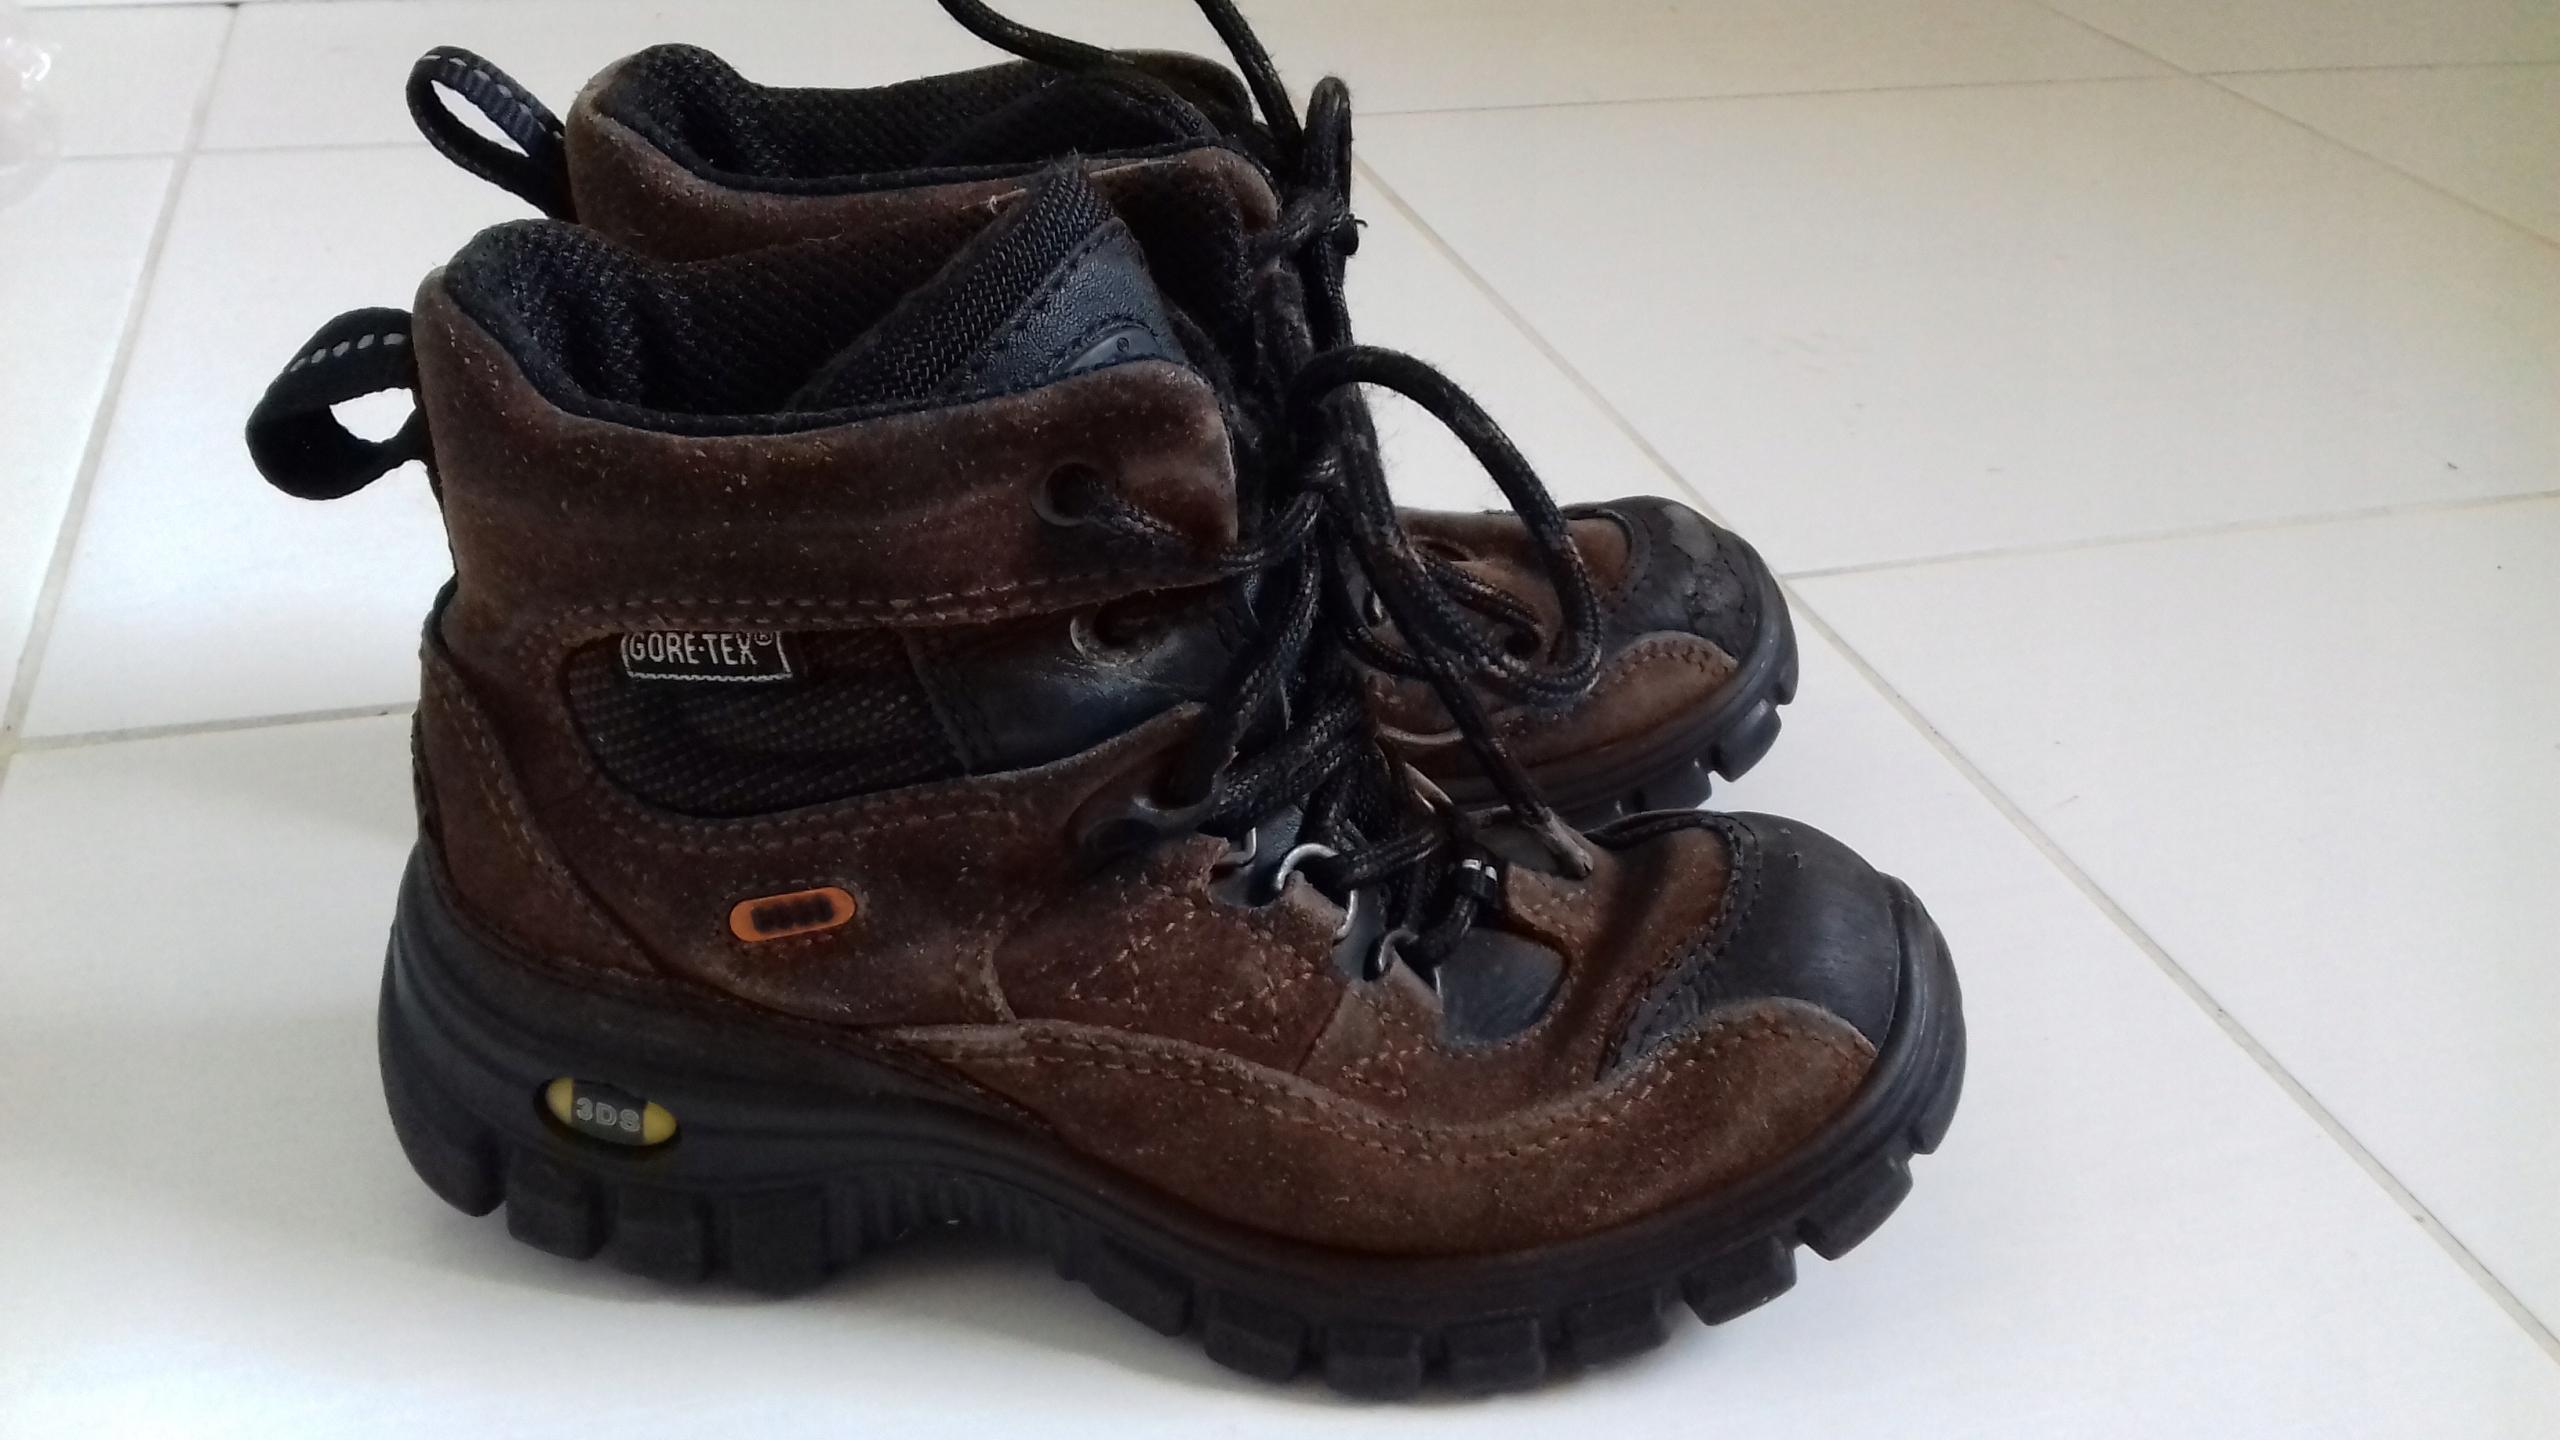 Buty skórzane traperki ECCO roz 30 19.5cm GORETEX